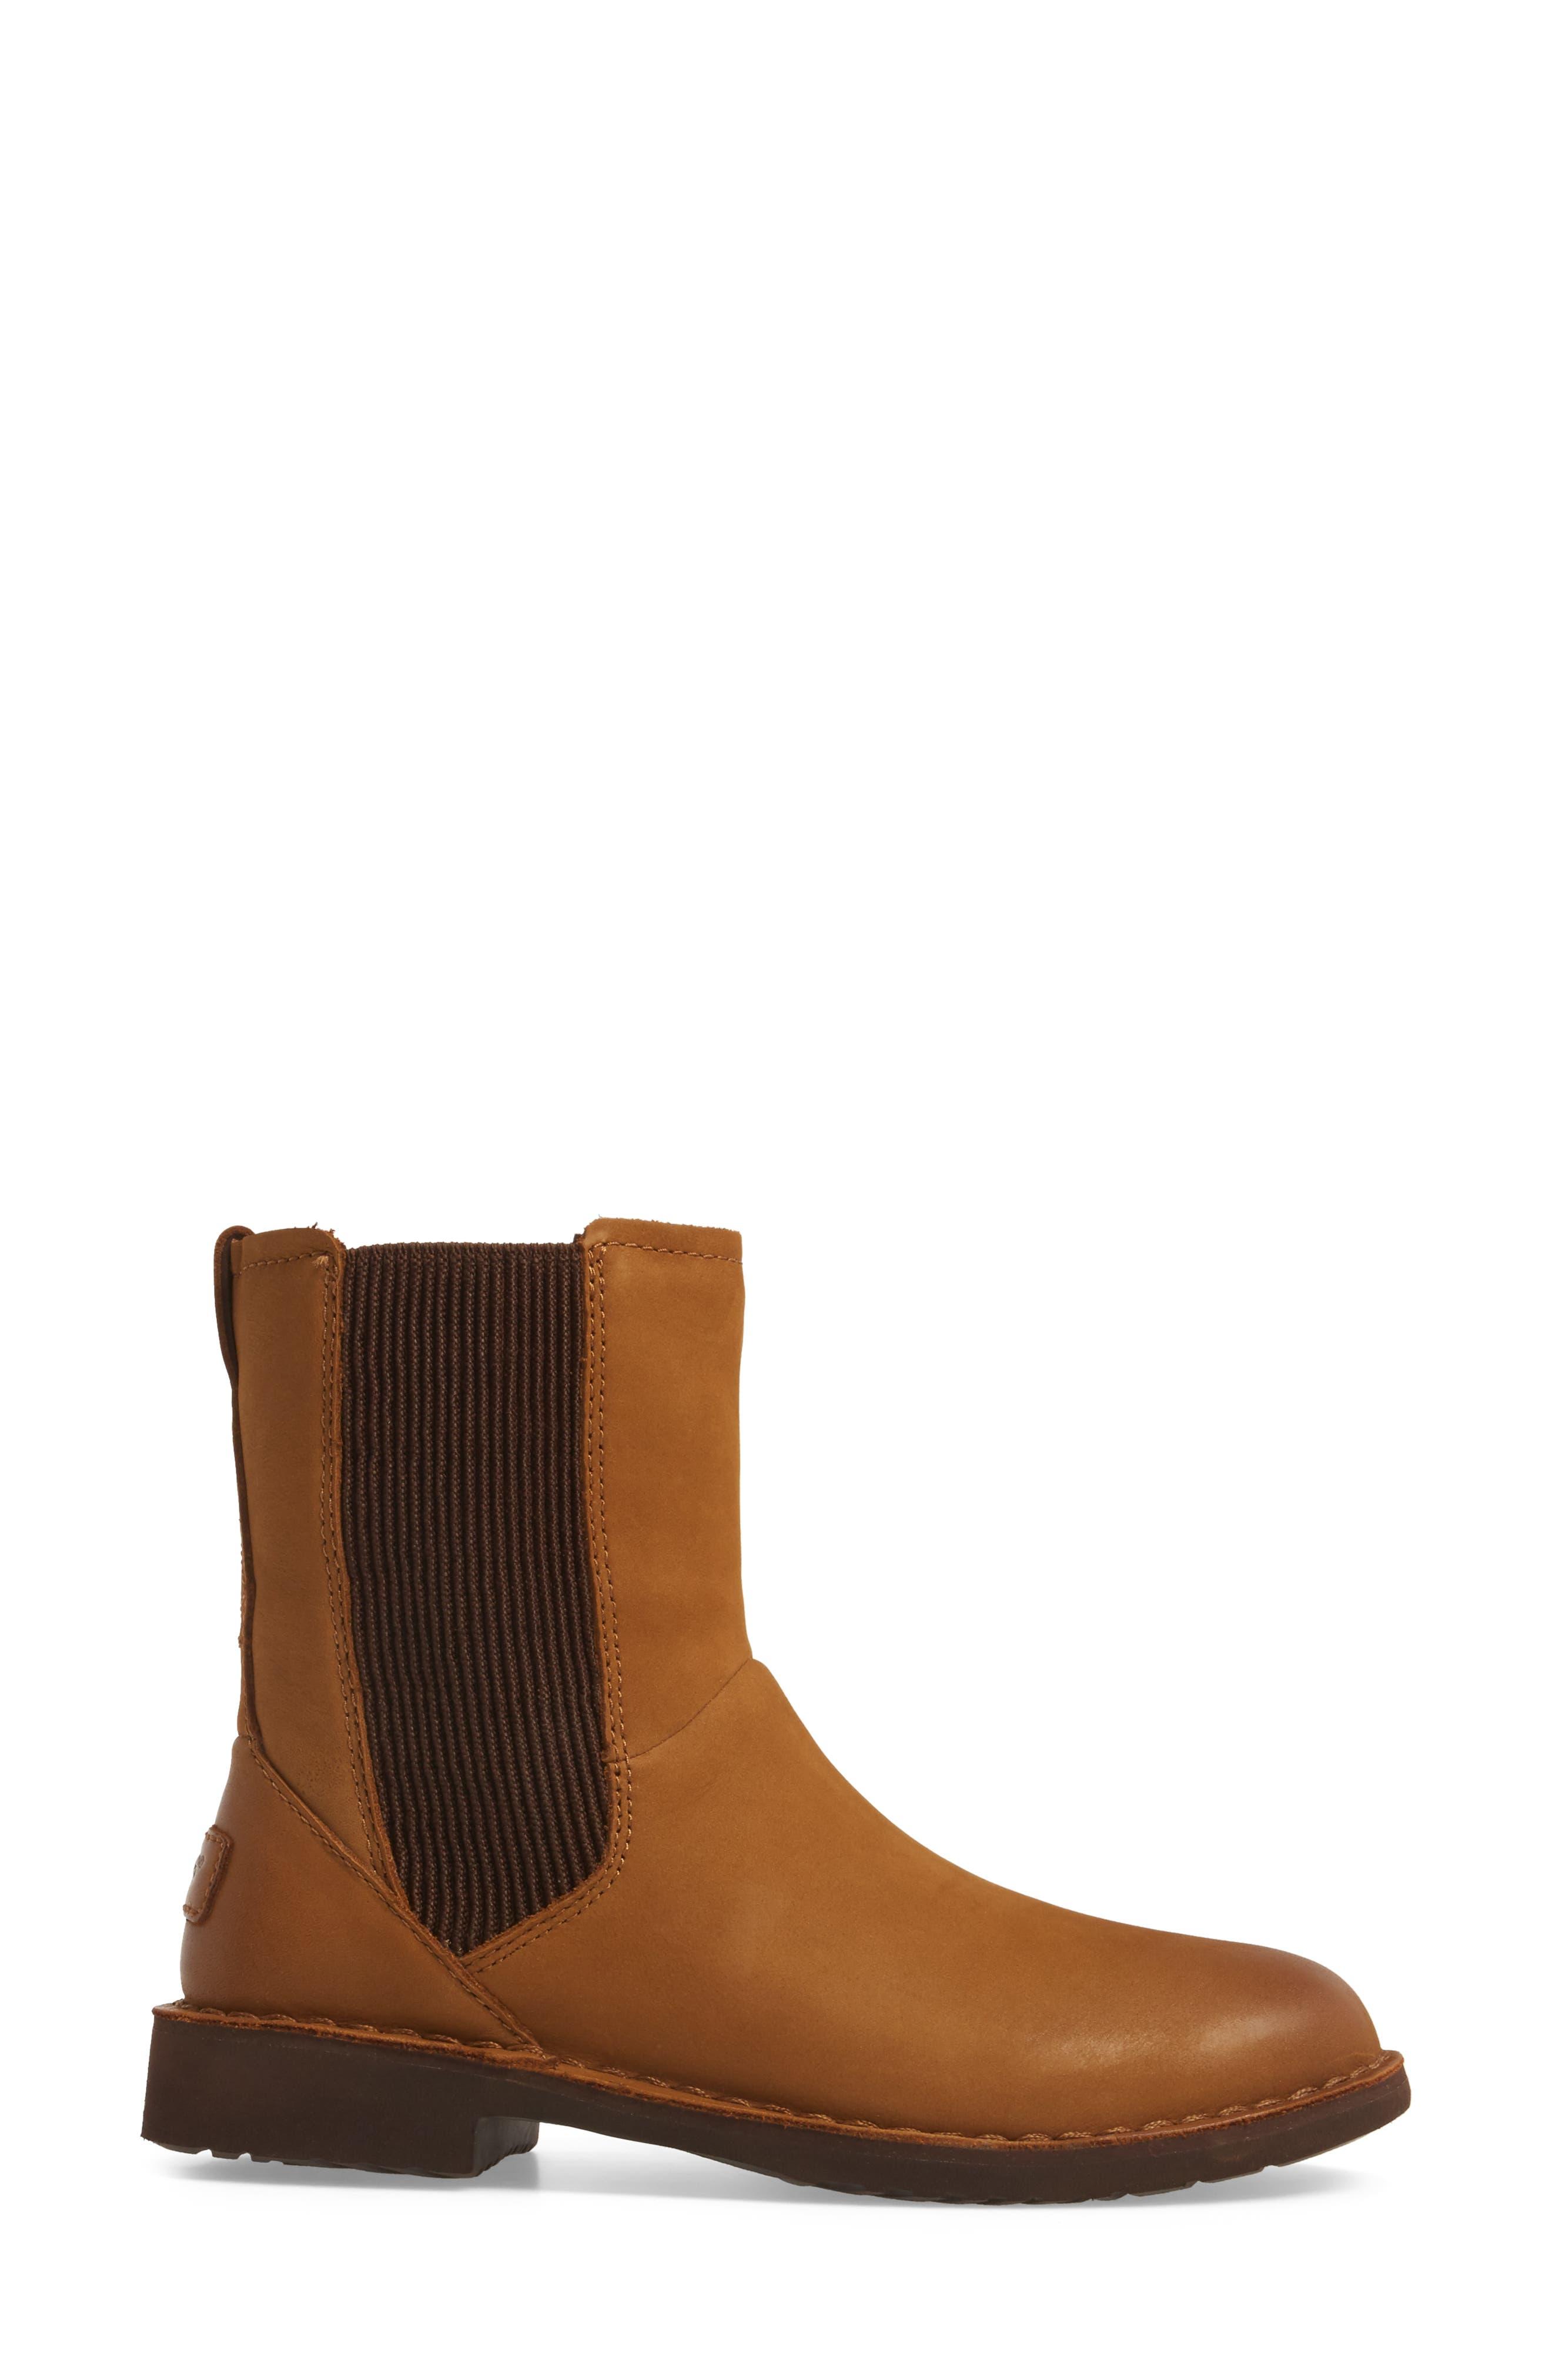 Larra Boot,                             Alternate thumbnail 3, color,                             Chestnut Nubuck Leather